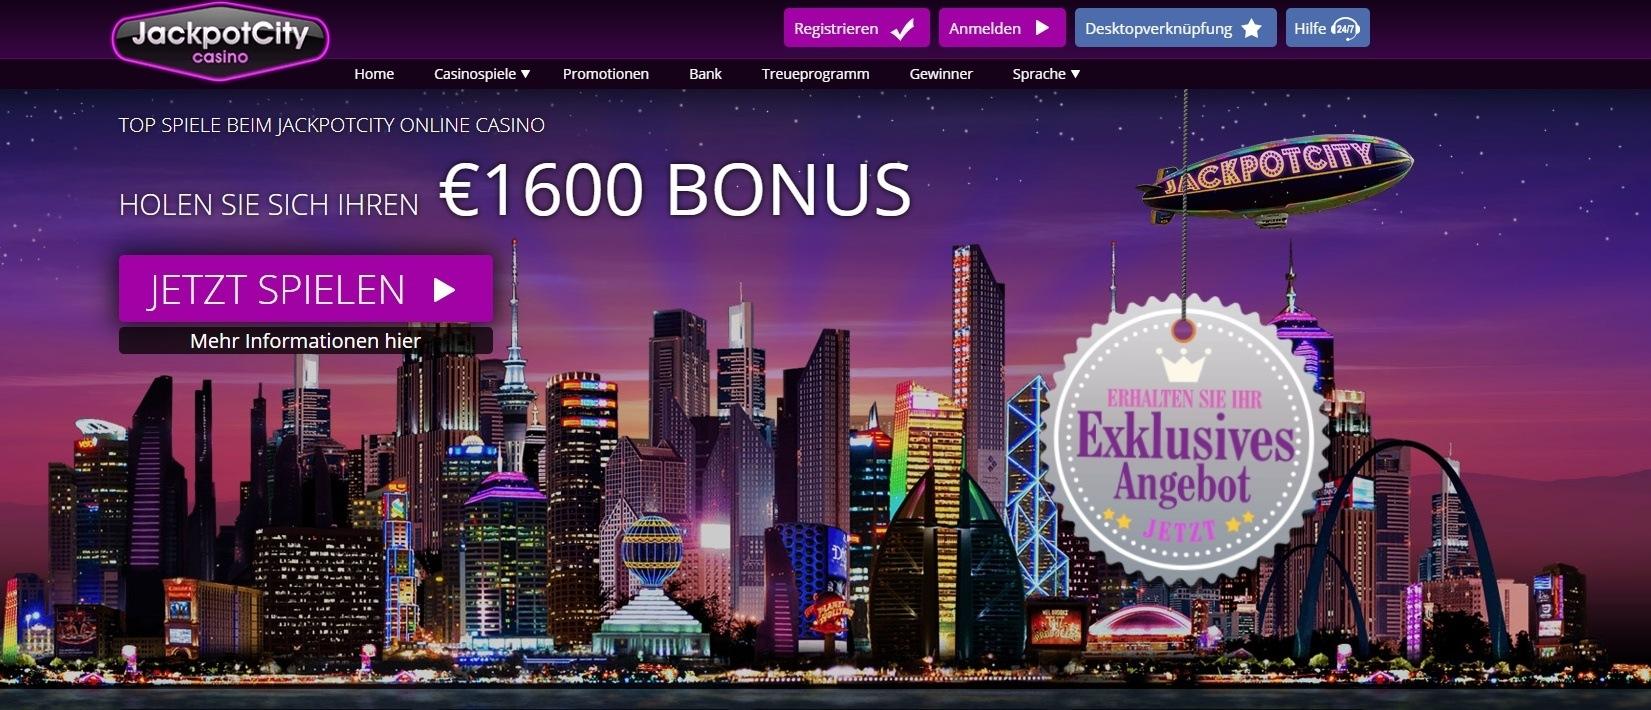 jackpotcity 1600$ bonus